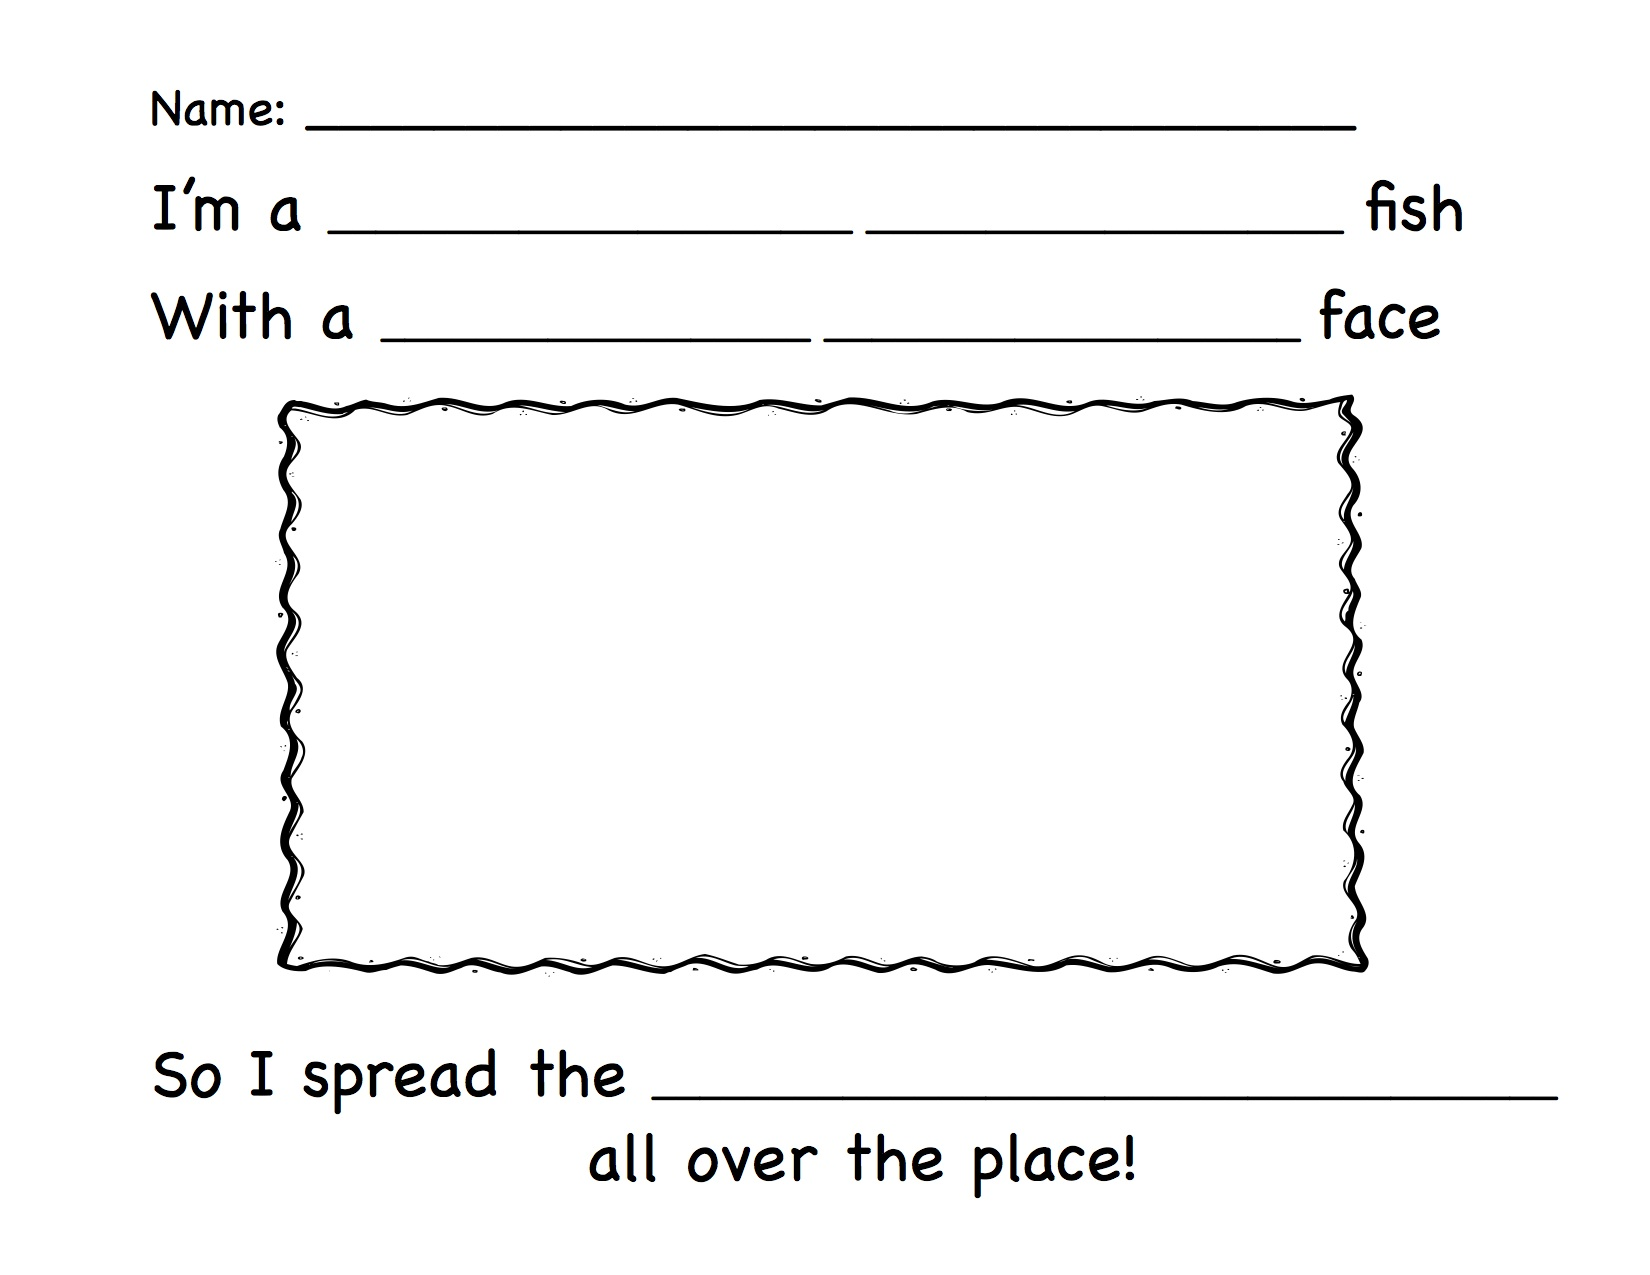 writing1 - Pout Pout Fish Coloring Page